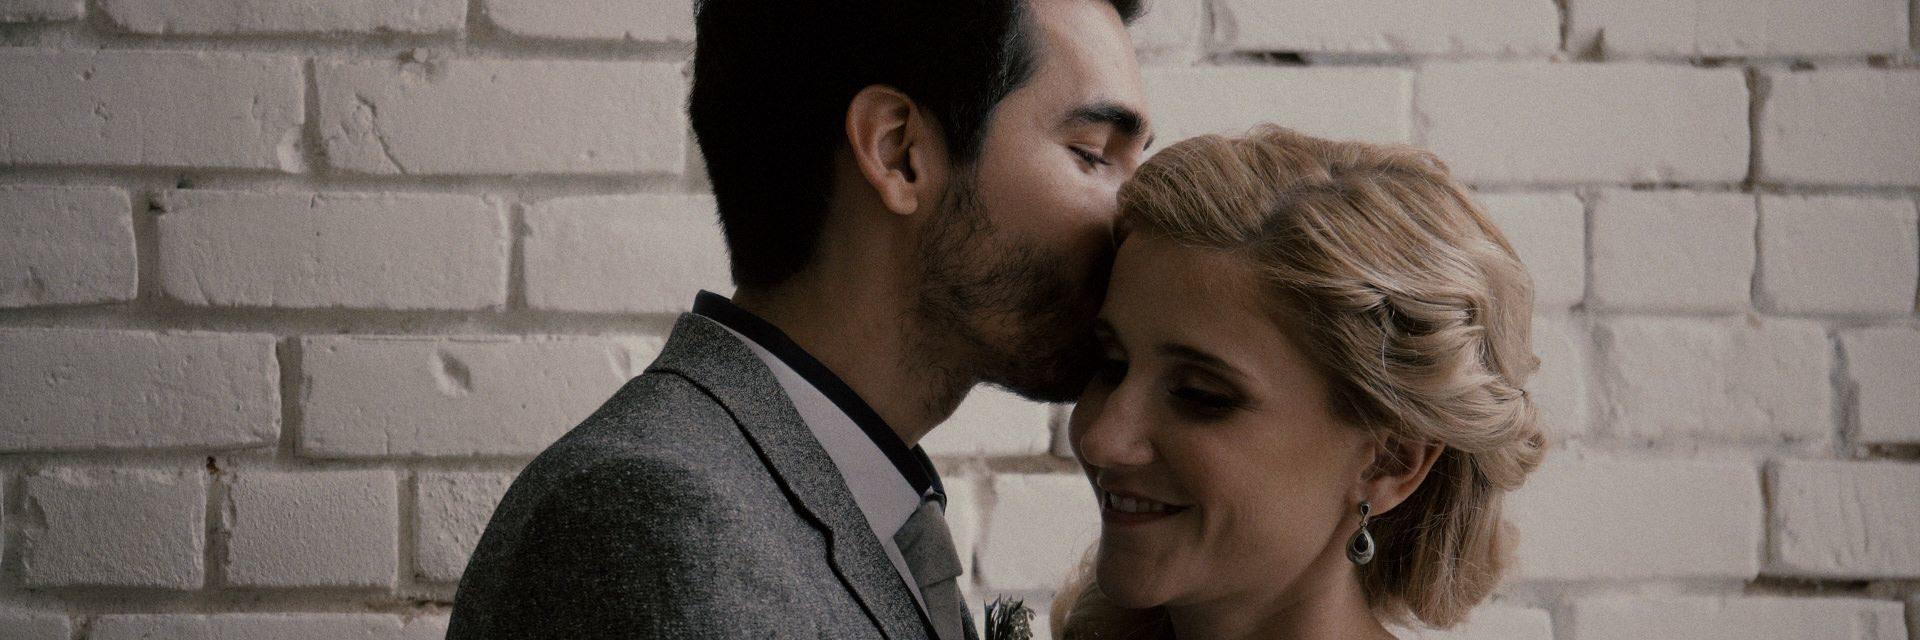 Algarve-wedding-videographer-cinemate-films-03